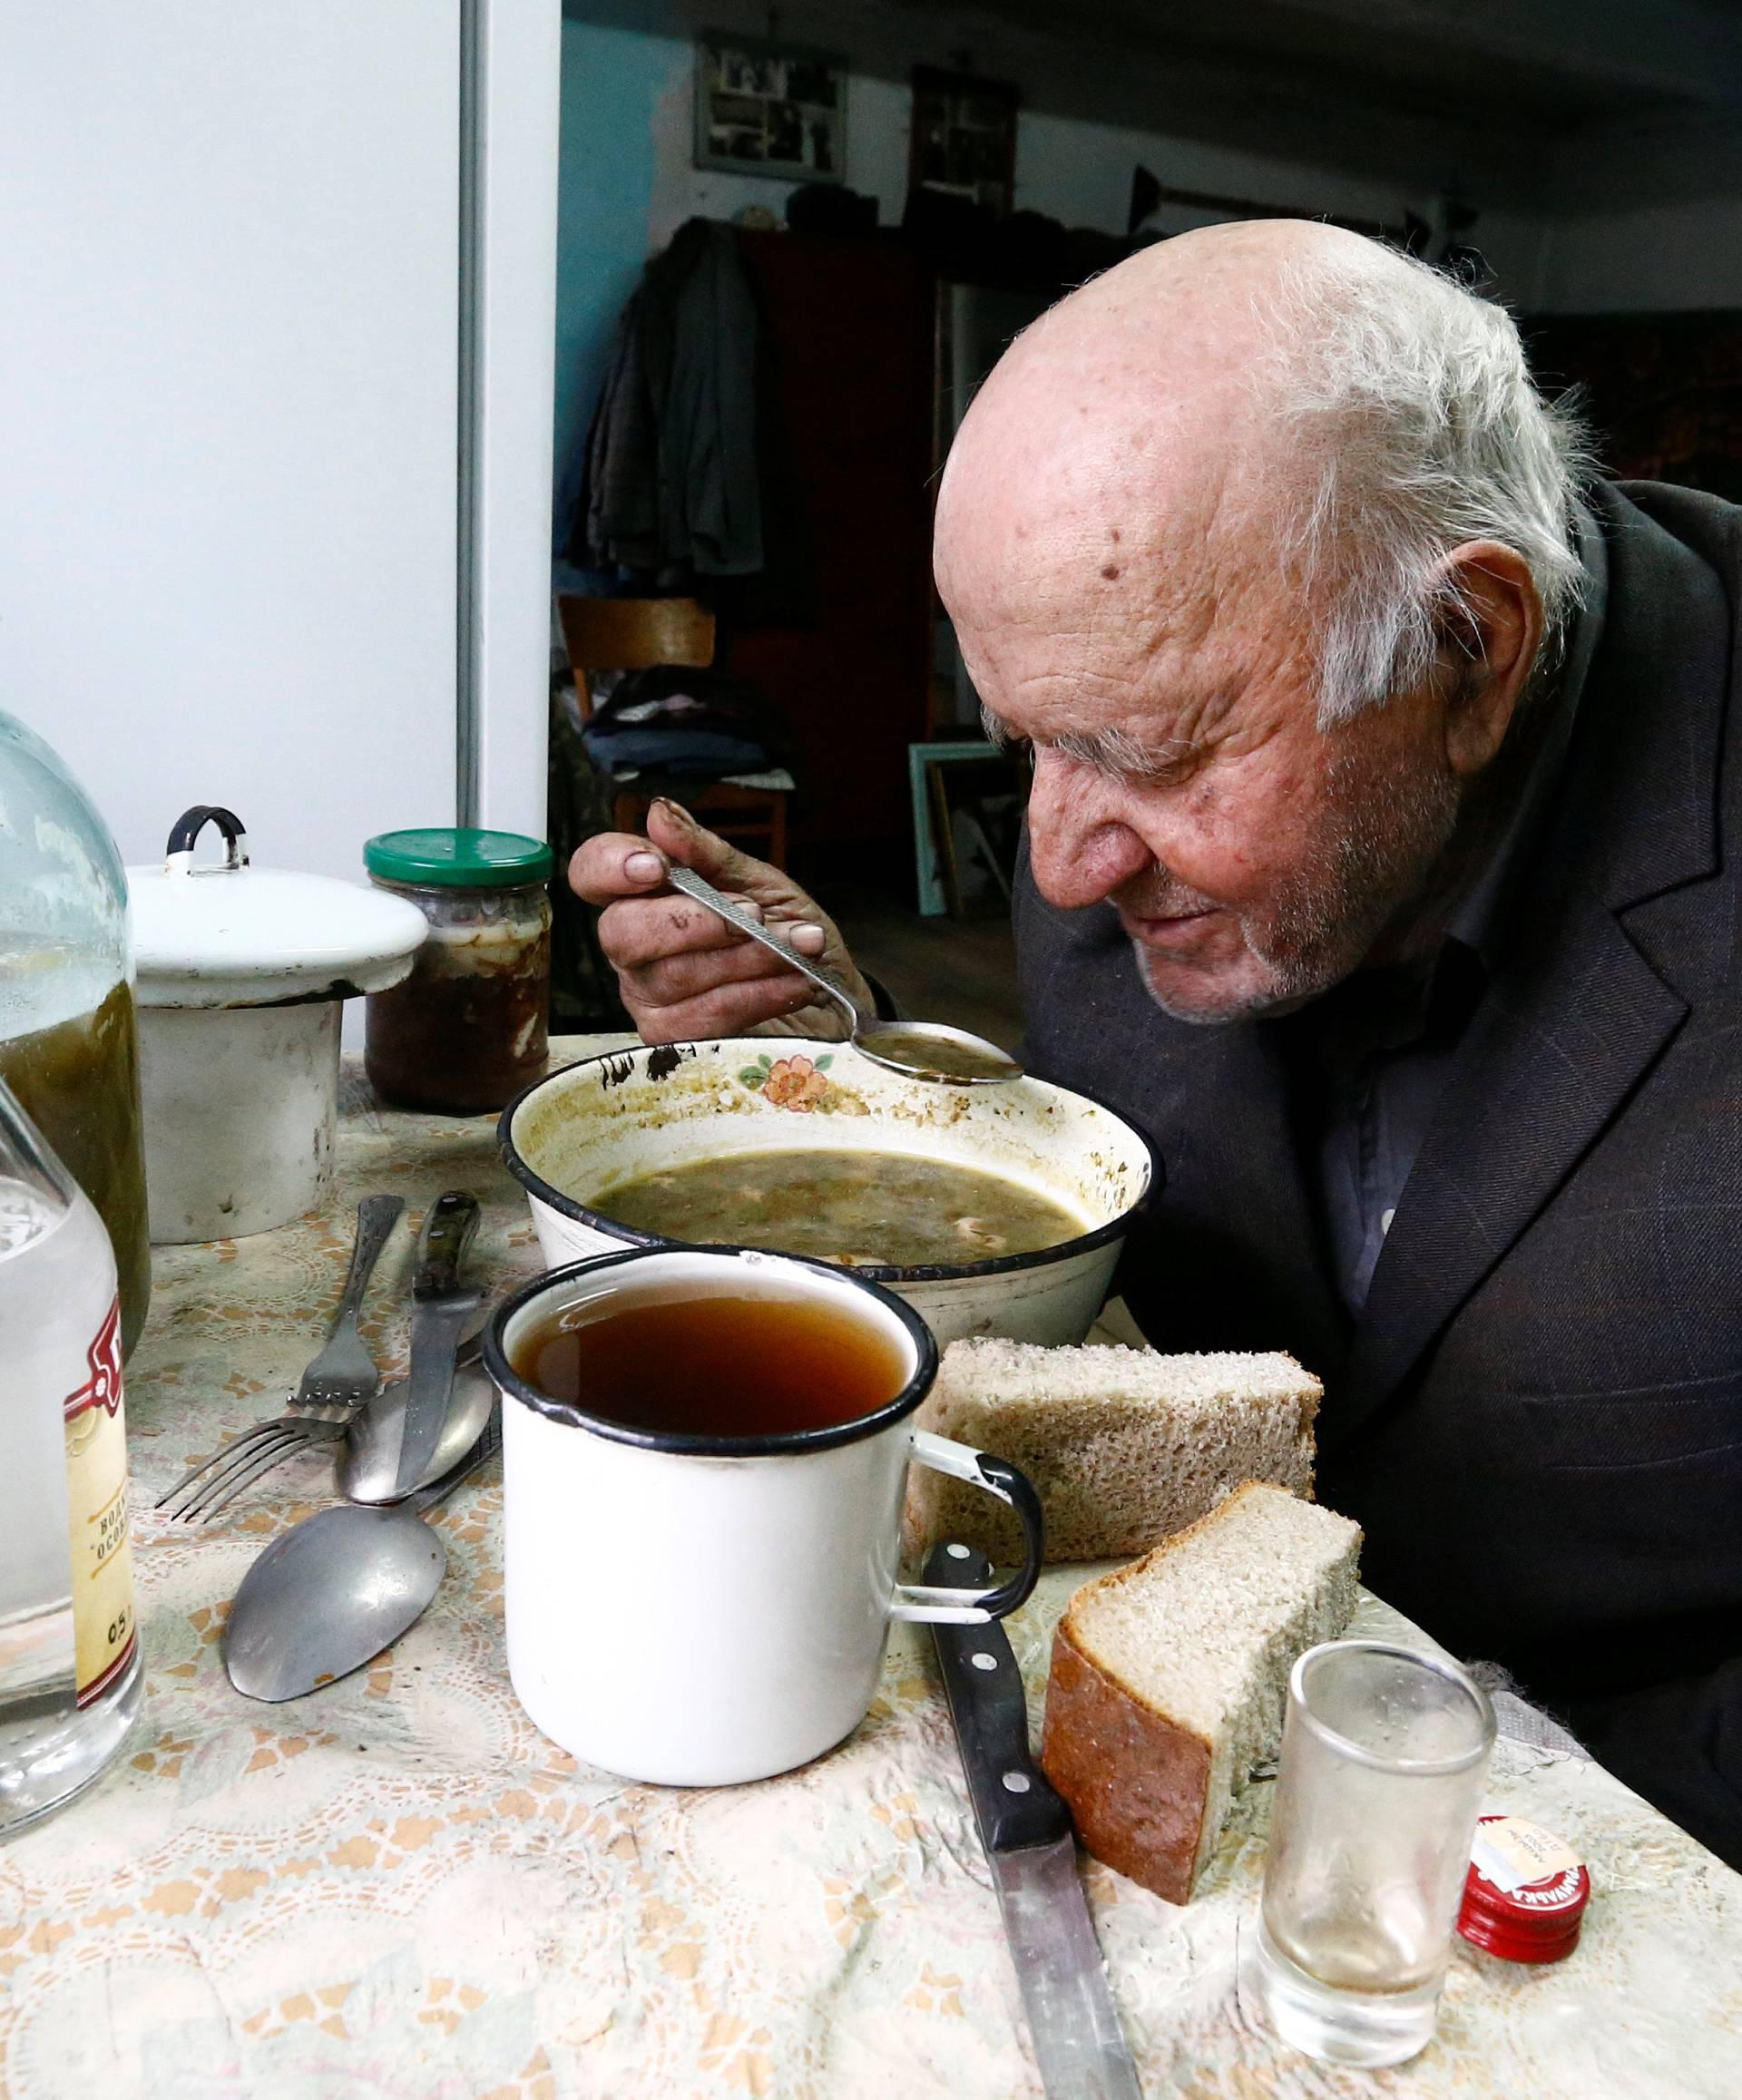 Jedini živi u zoni Černobila: Živ sam jer nisam otišao...